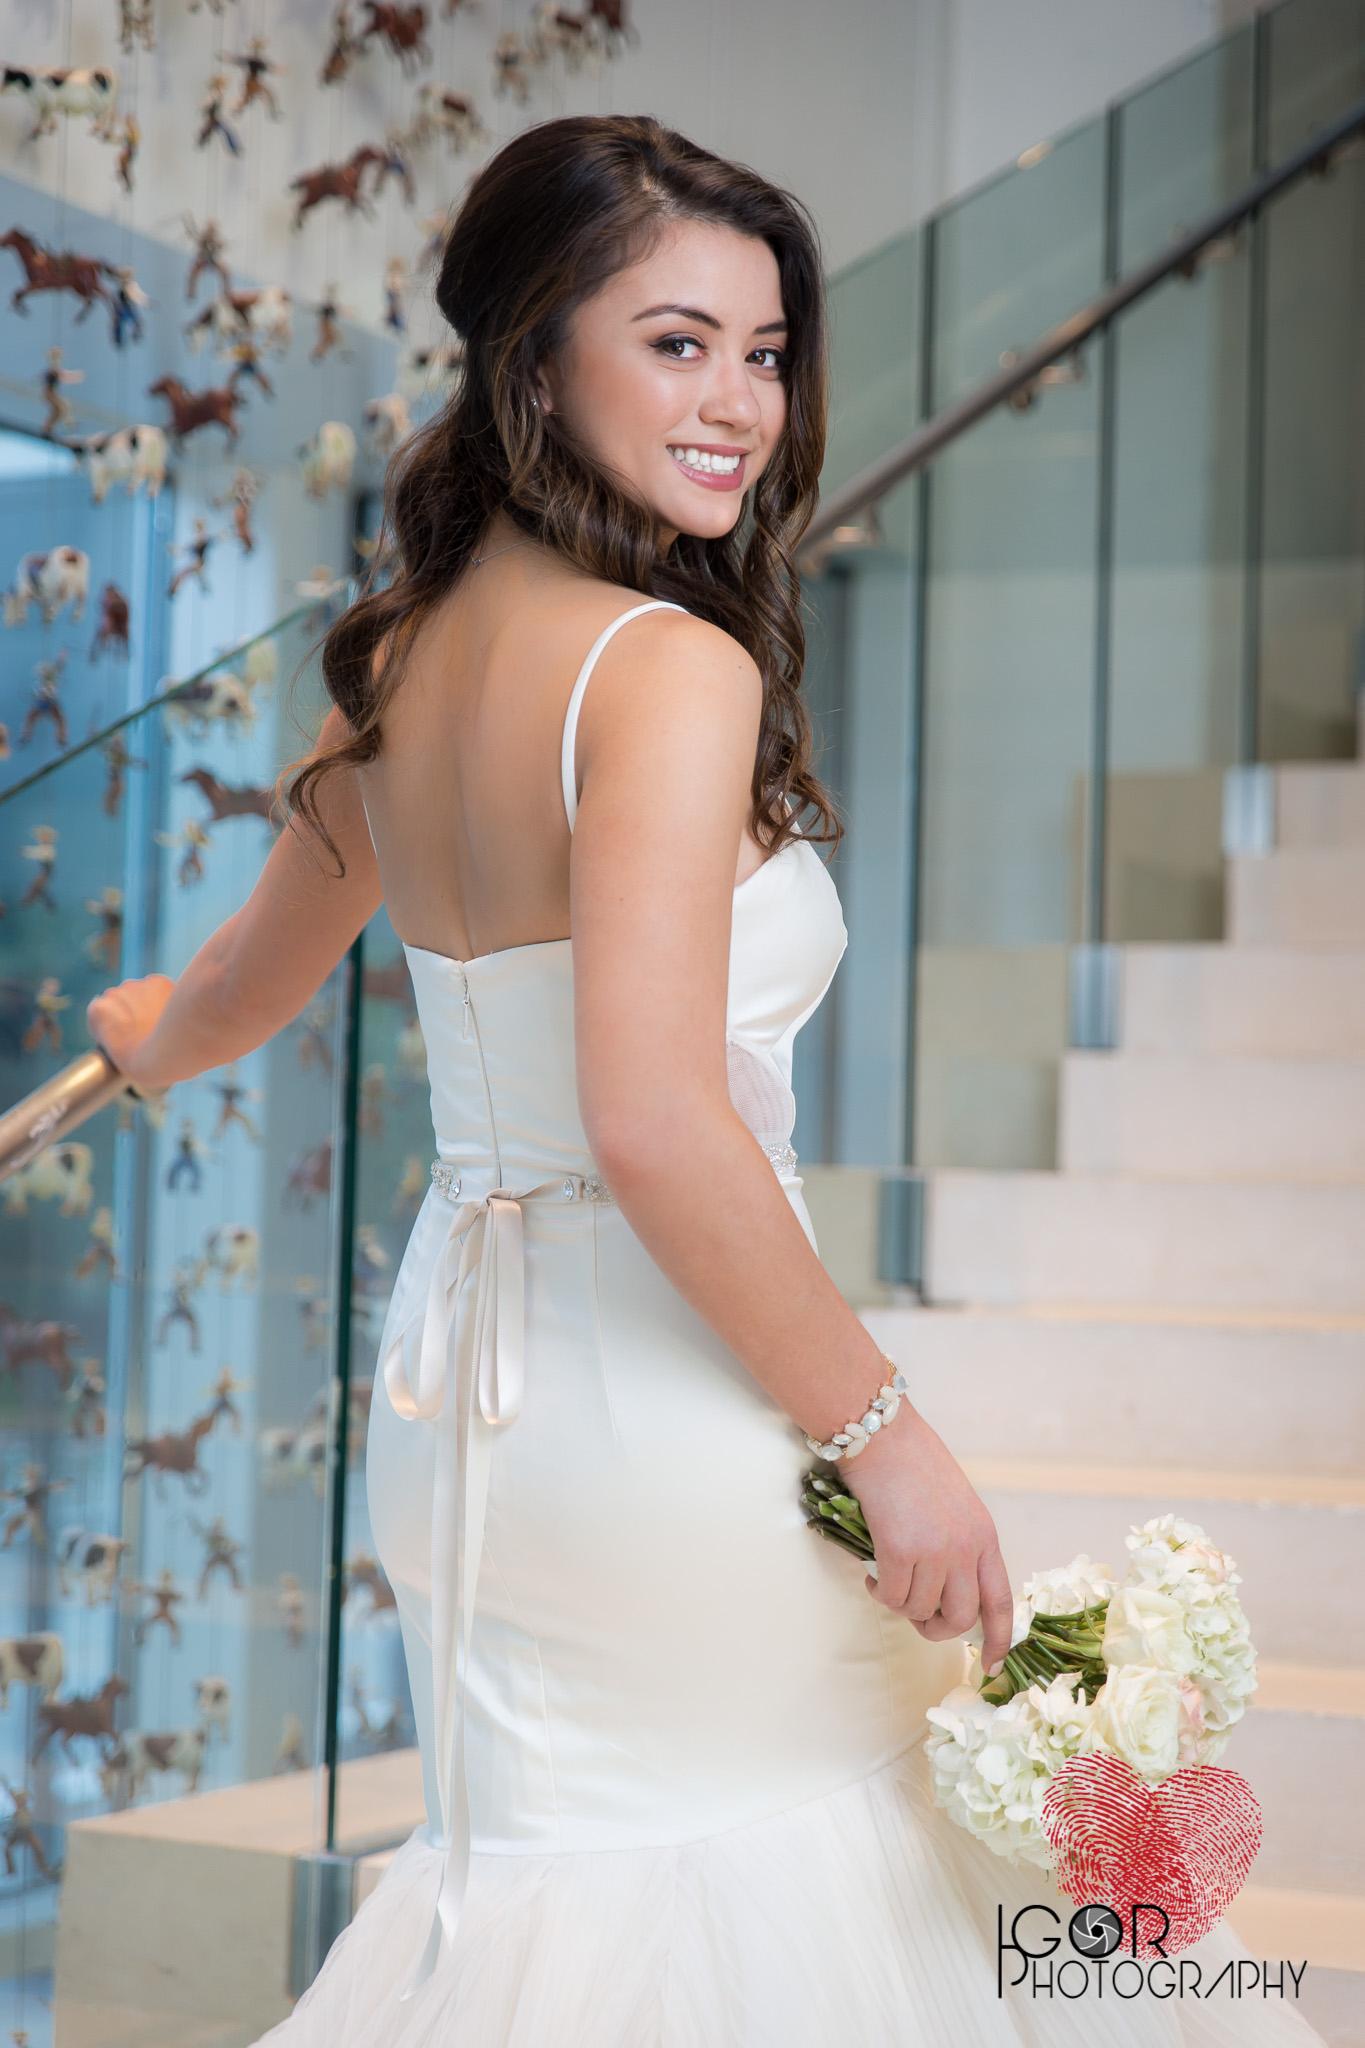 Dalls hotel bride pictures